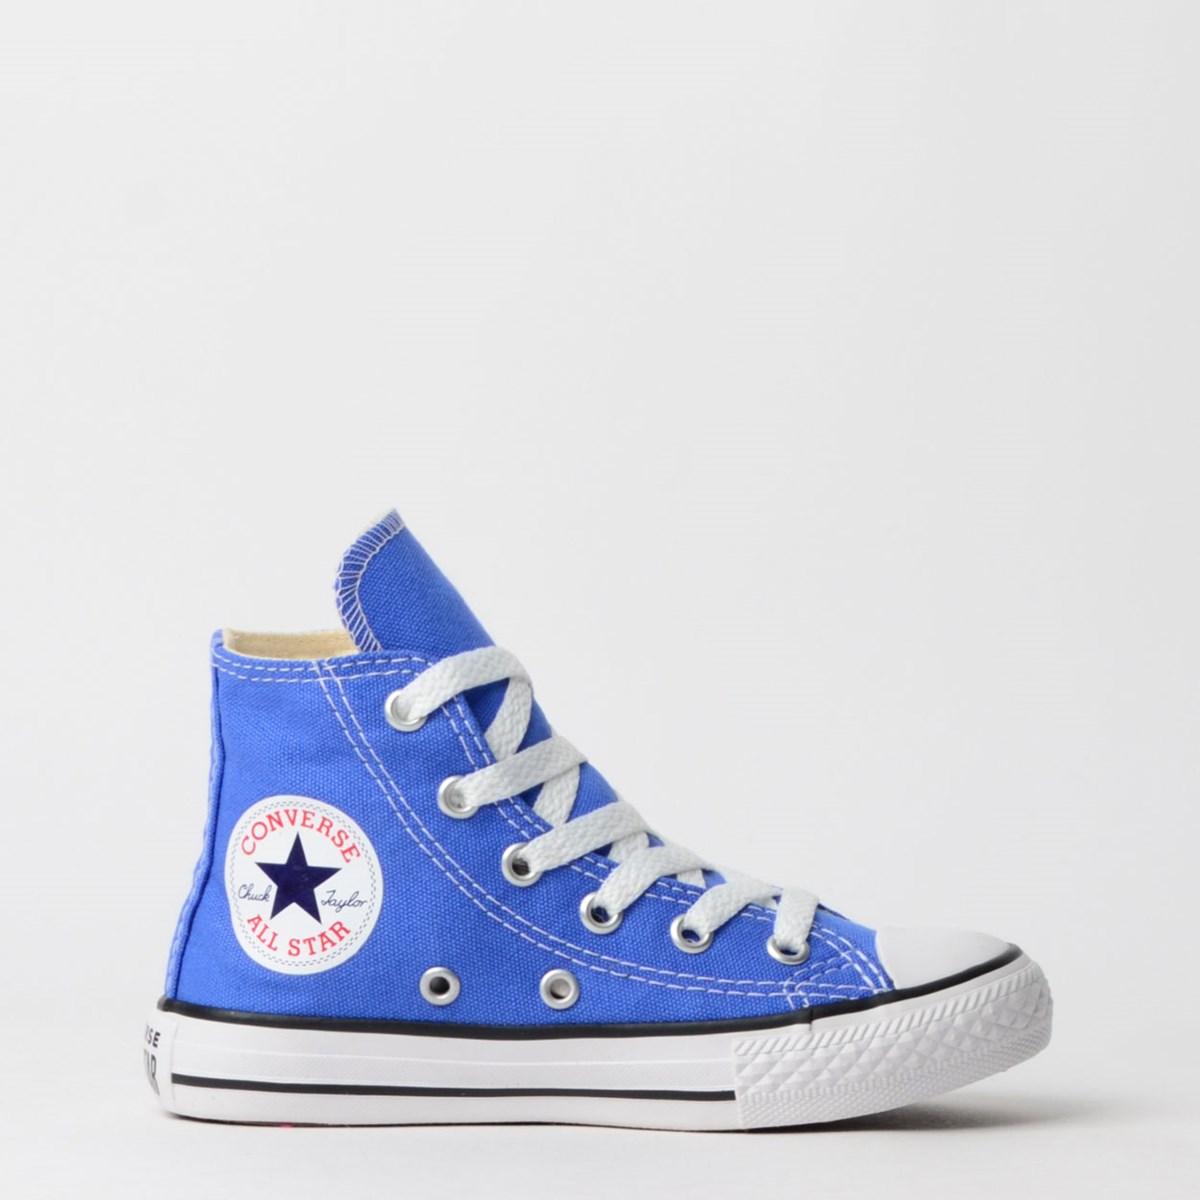 Tênis Converse Chuck Taylor All Star Seasonal Kids Azul Aurora CK04280017